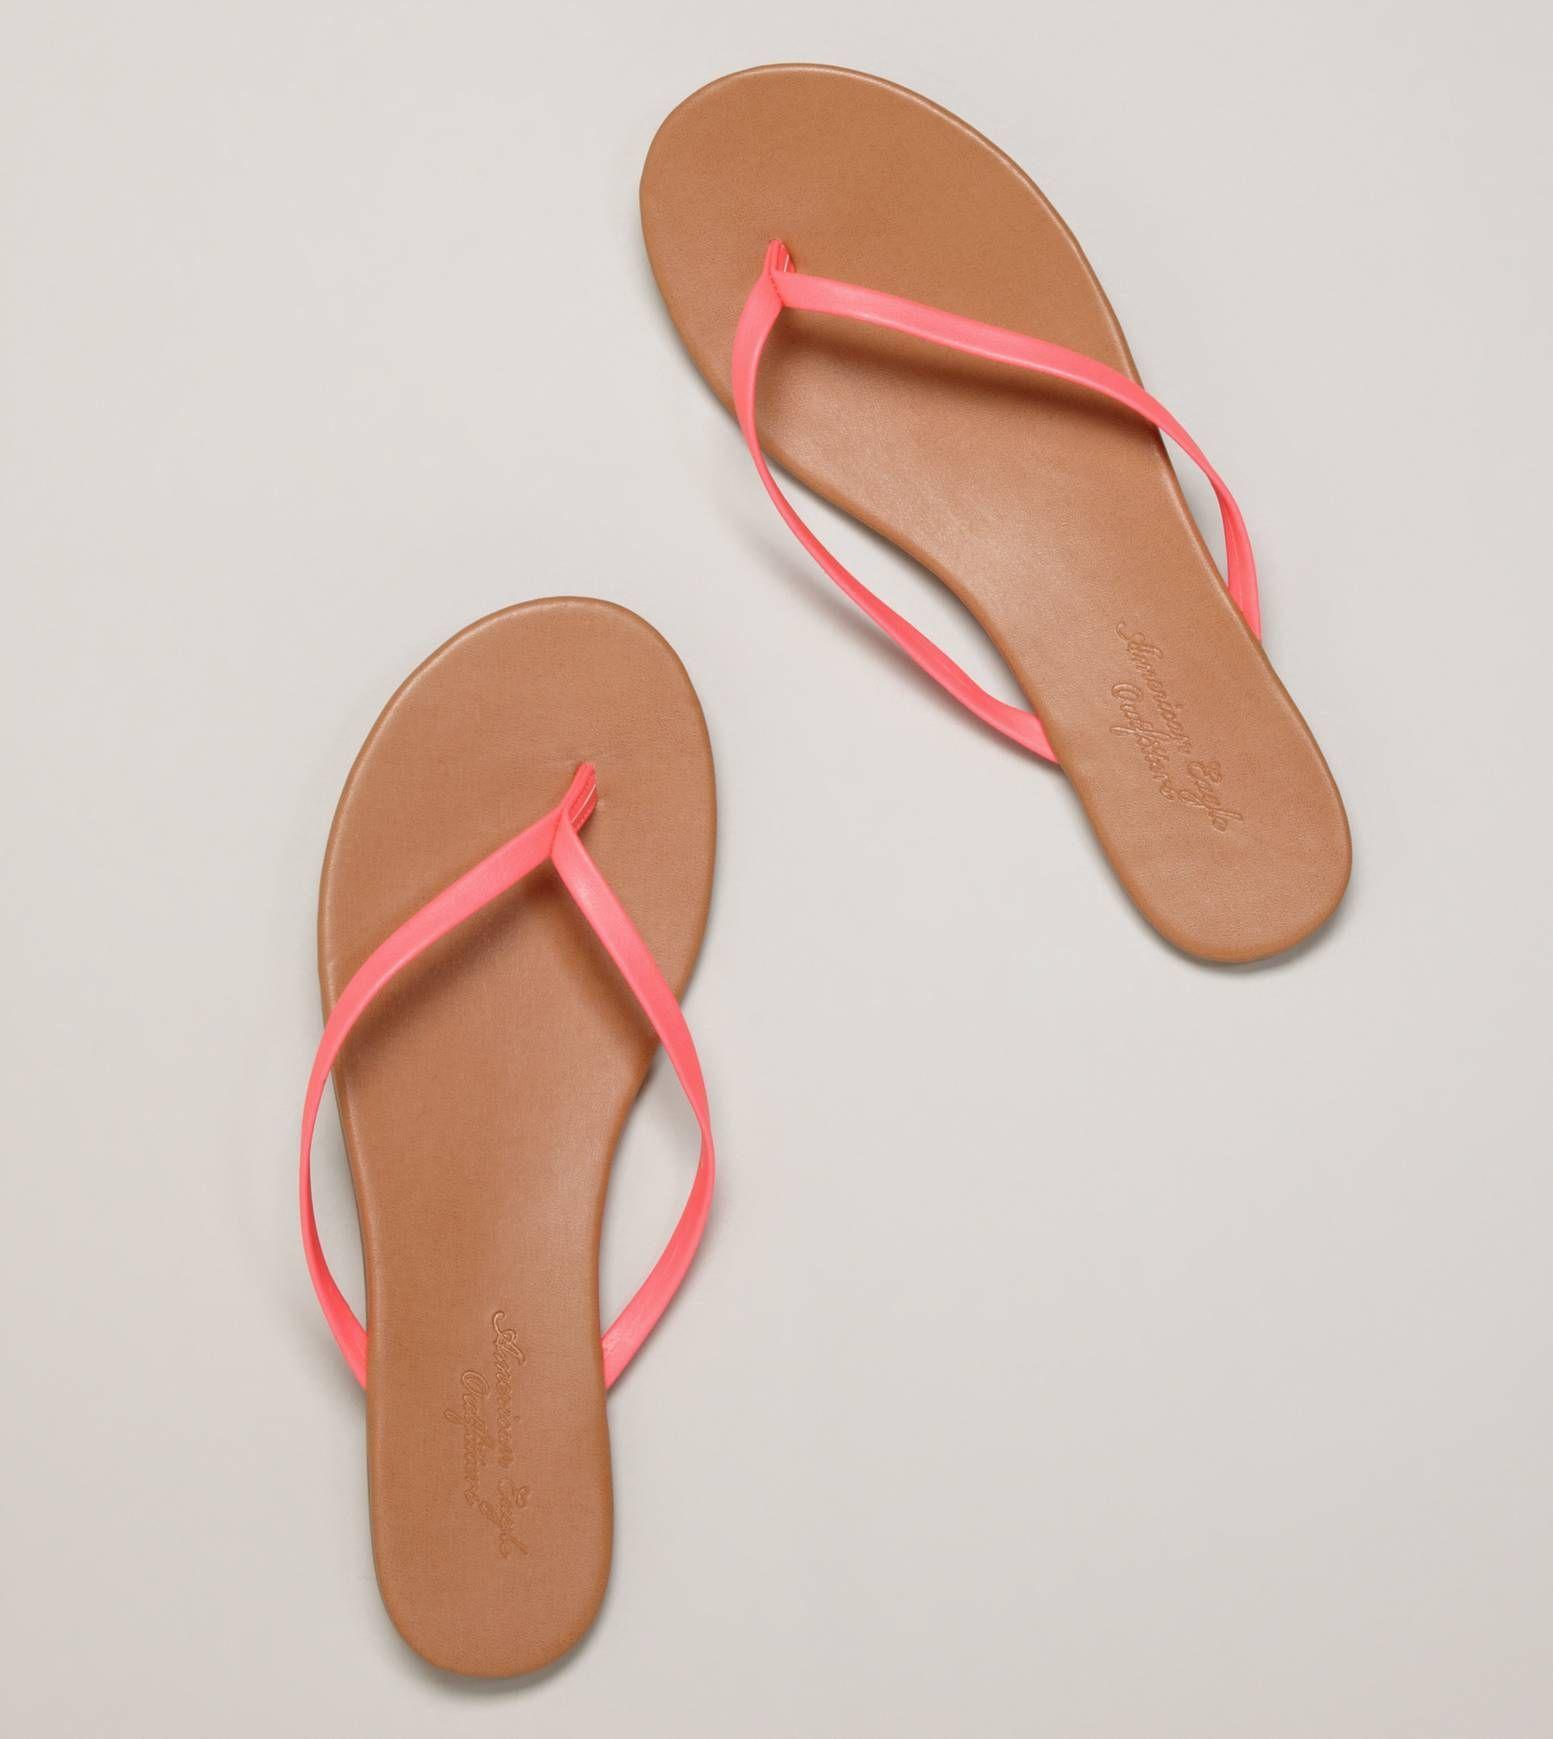 Aeo Skinny Flip Flop Light Neon Pink Style Pink Summer